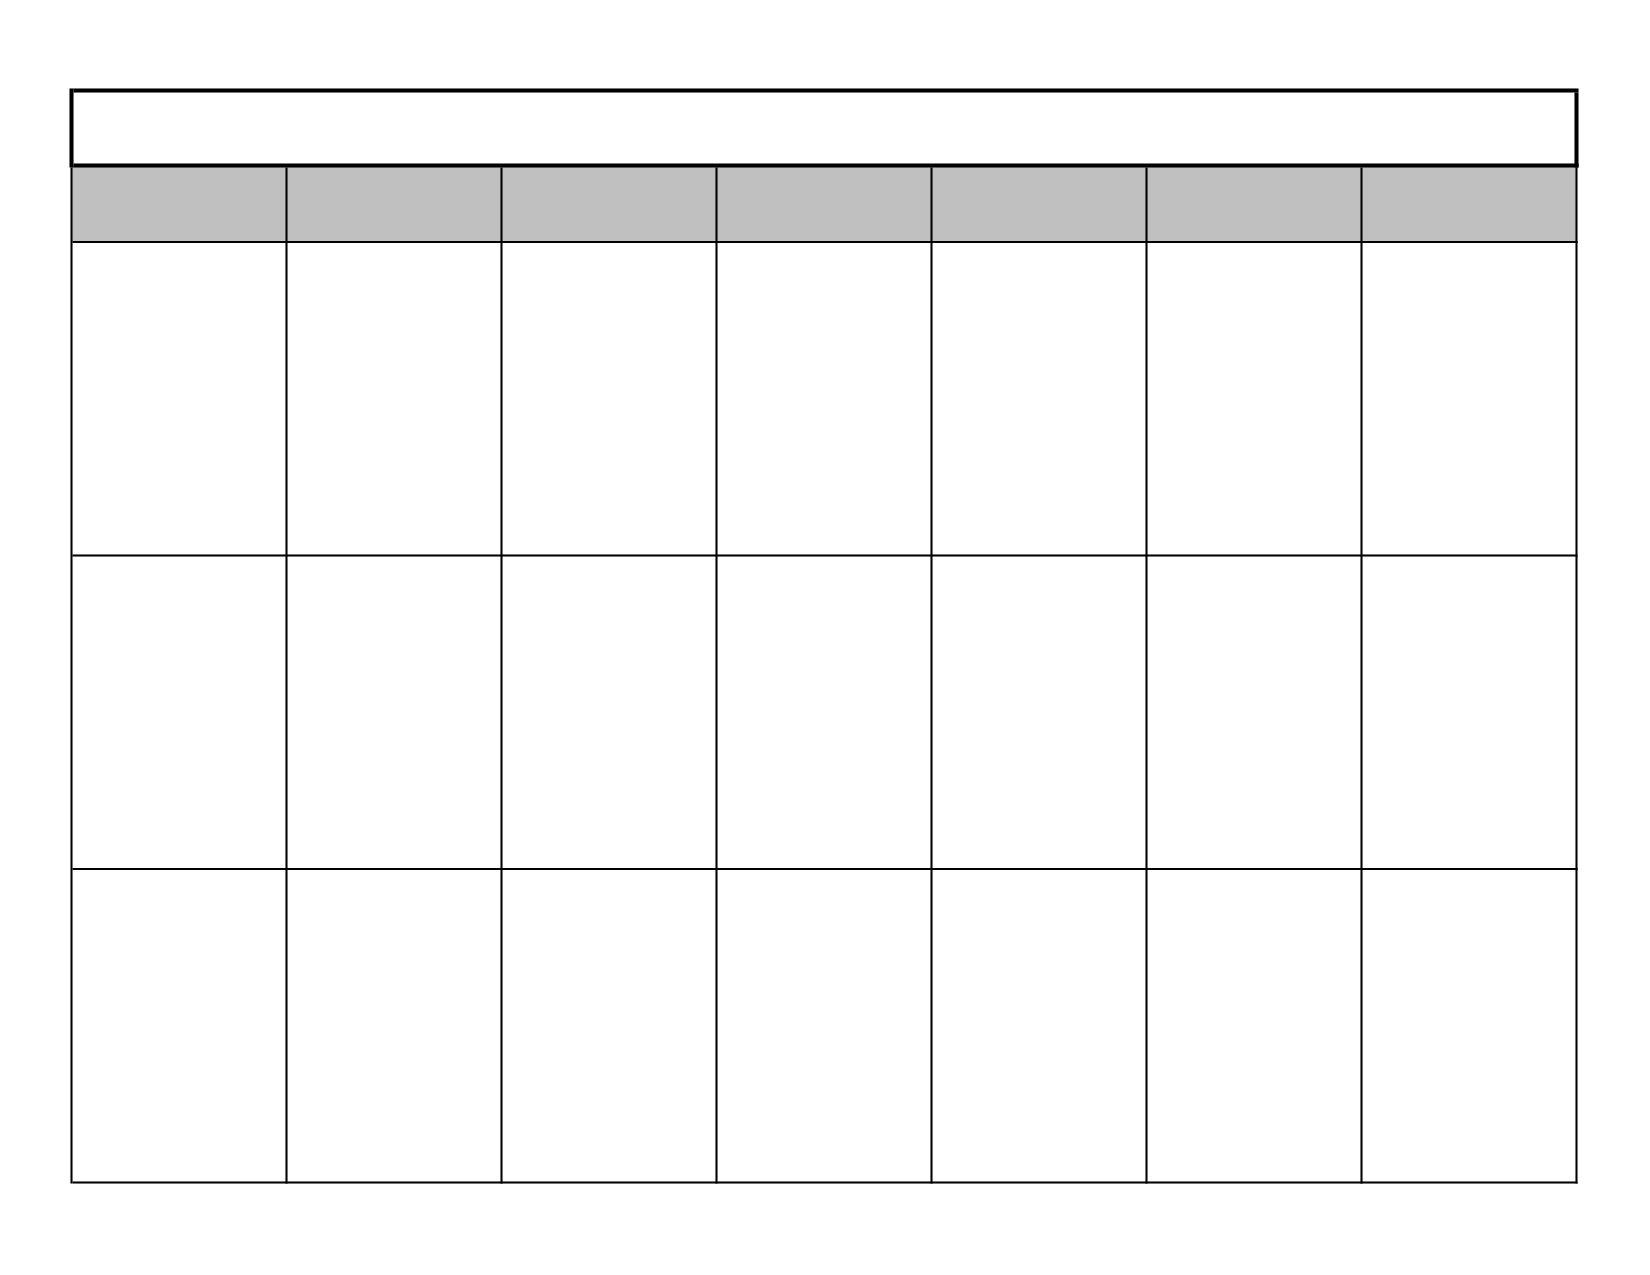 3 Week Calendar - Grude.interpretomics.co Catch | Blank 3 Week Calendar Template